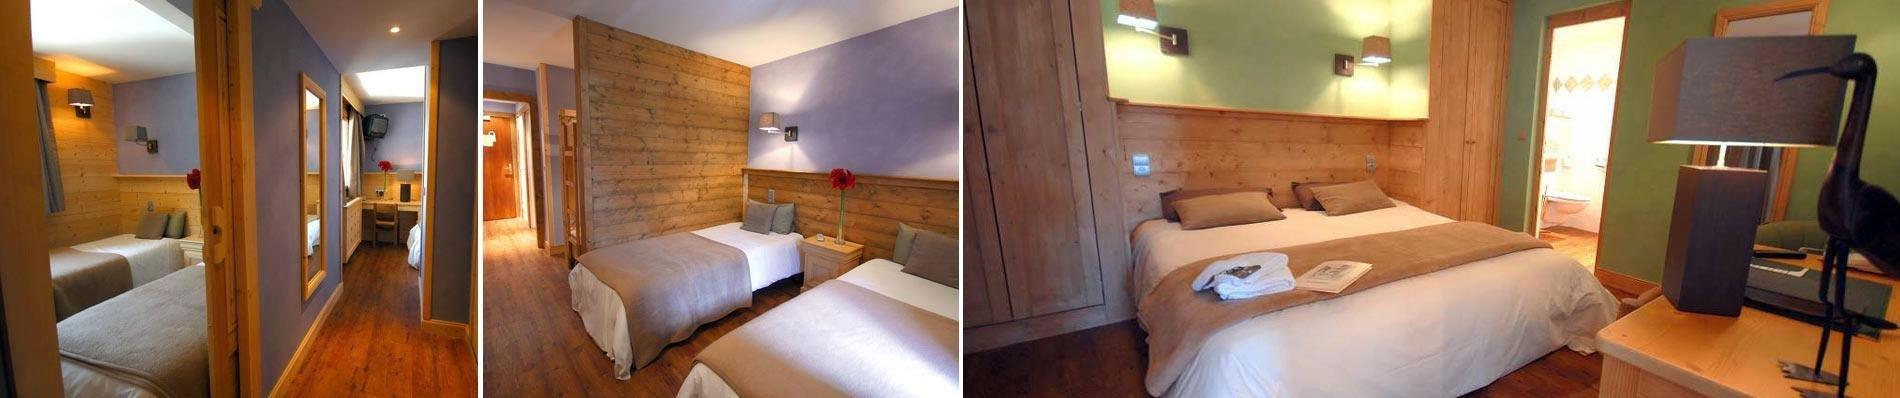 HOTEL-LE MONAL SAINTE FOY ski tarentaise hors piste